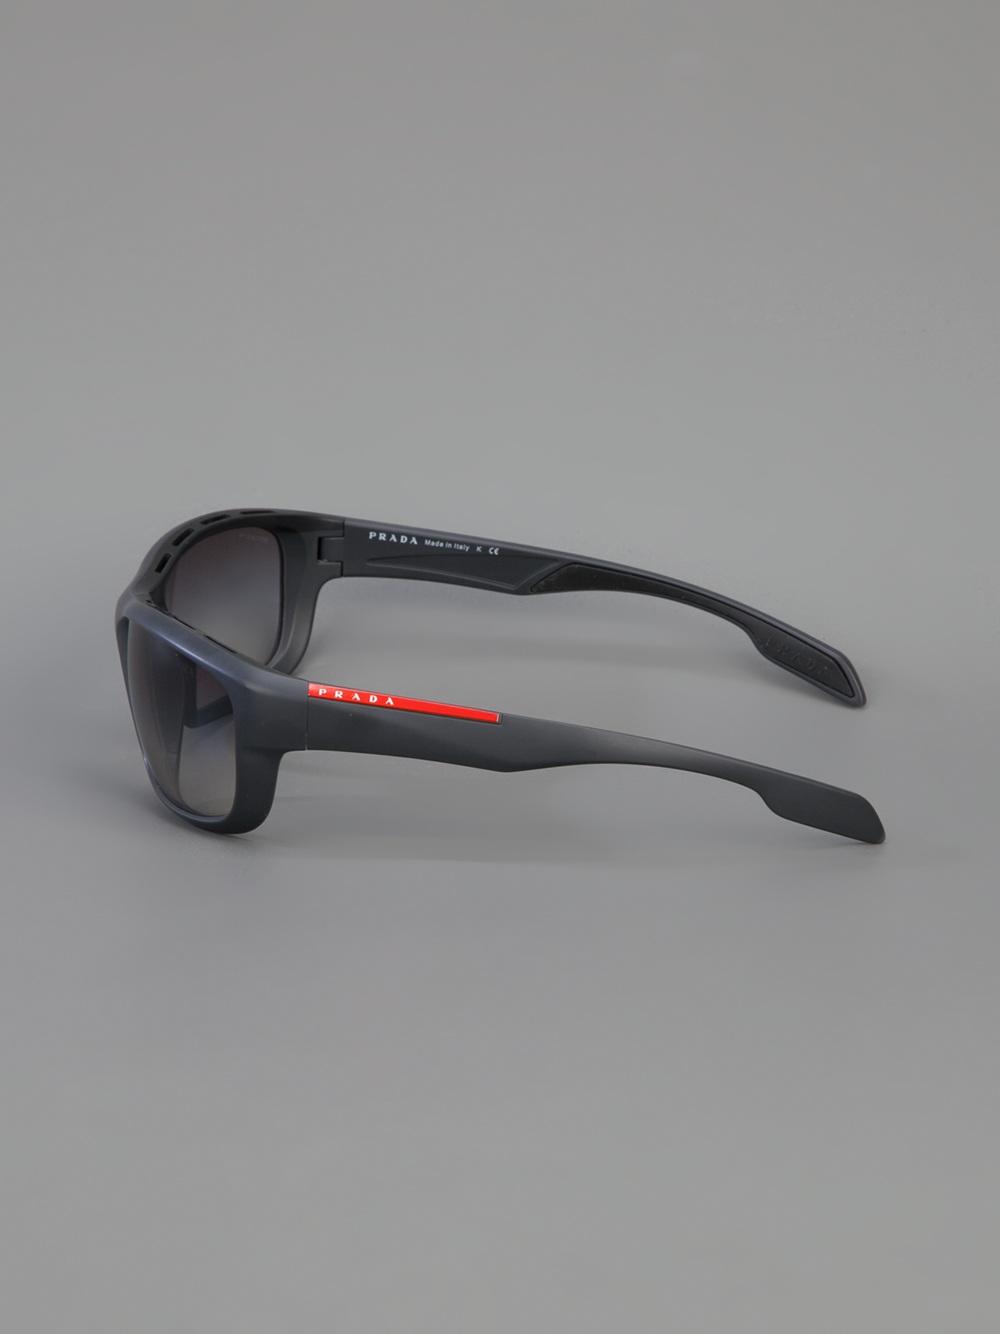 fa210a30a502 ... where can i buy lyst prada wrap around sunglasses in gray for men a736f  e62a0